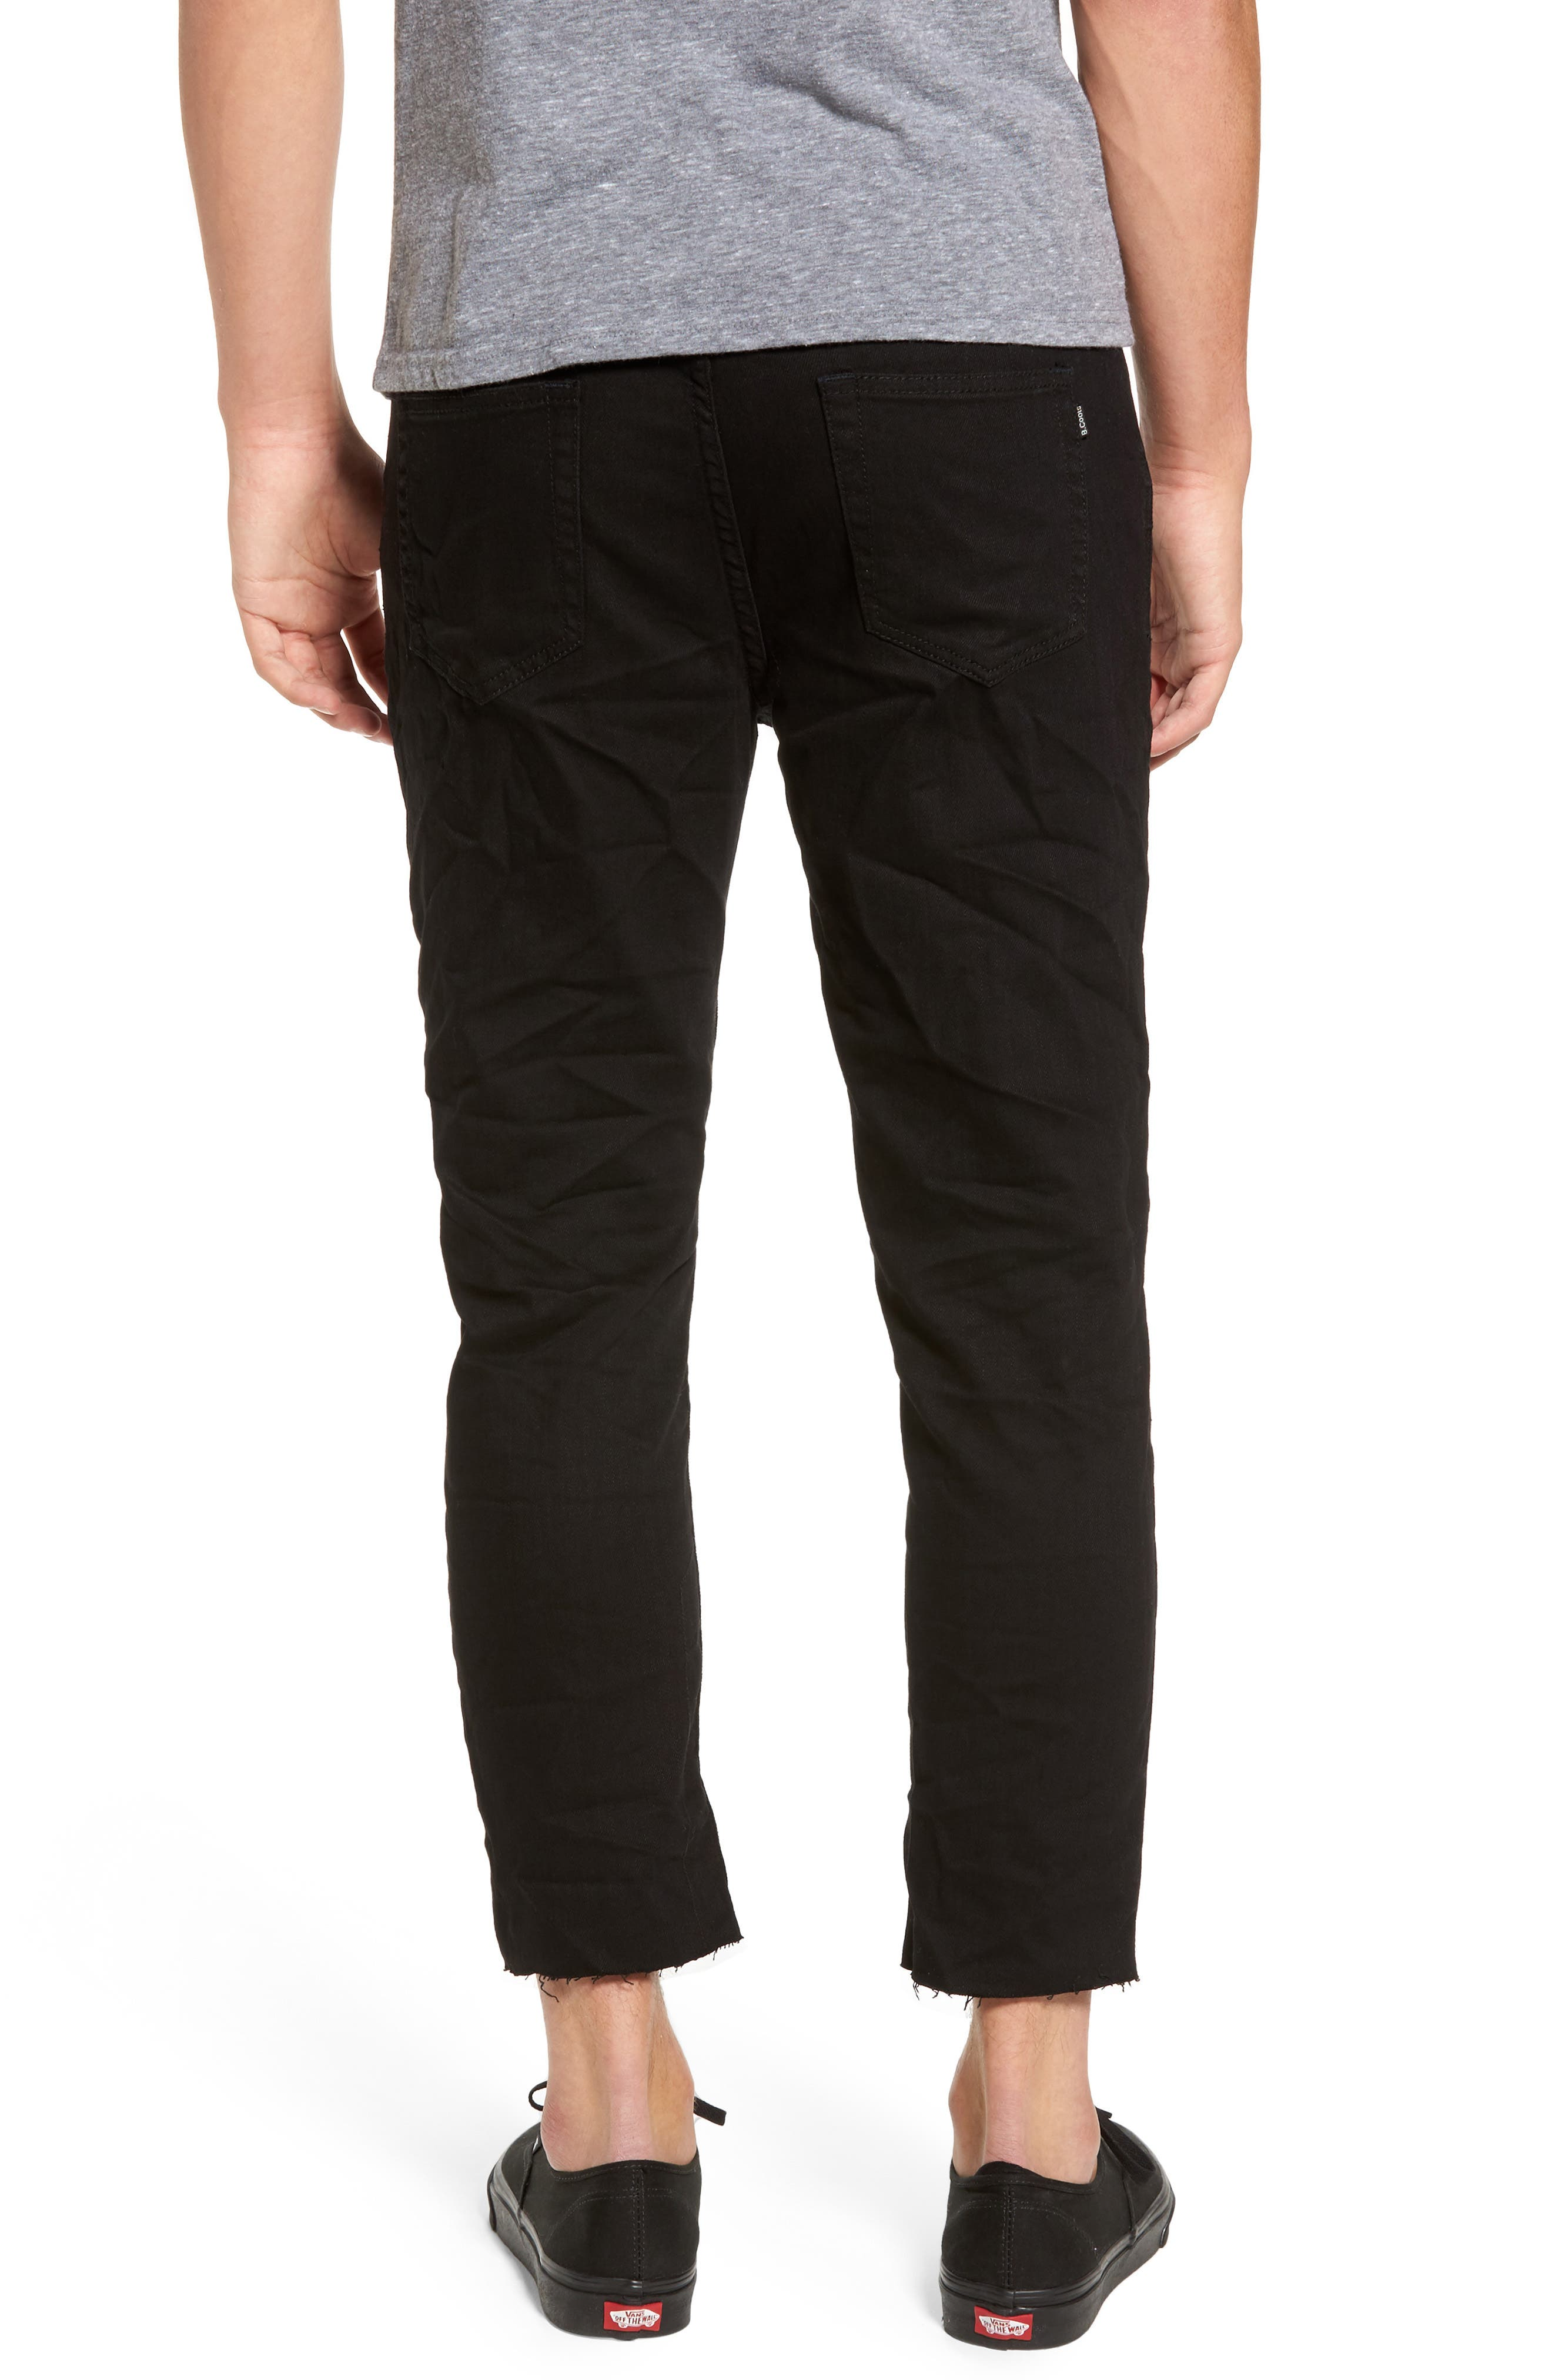 B.Line Crop Slim Fit Jeans,                             Alternate thumbnail 2, color,                             Washed Black